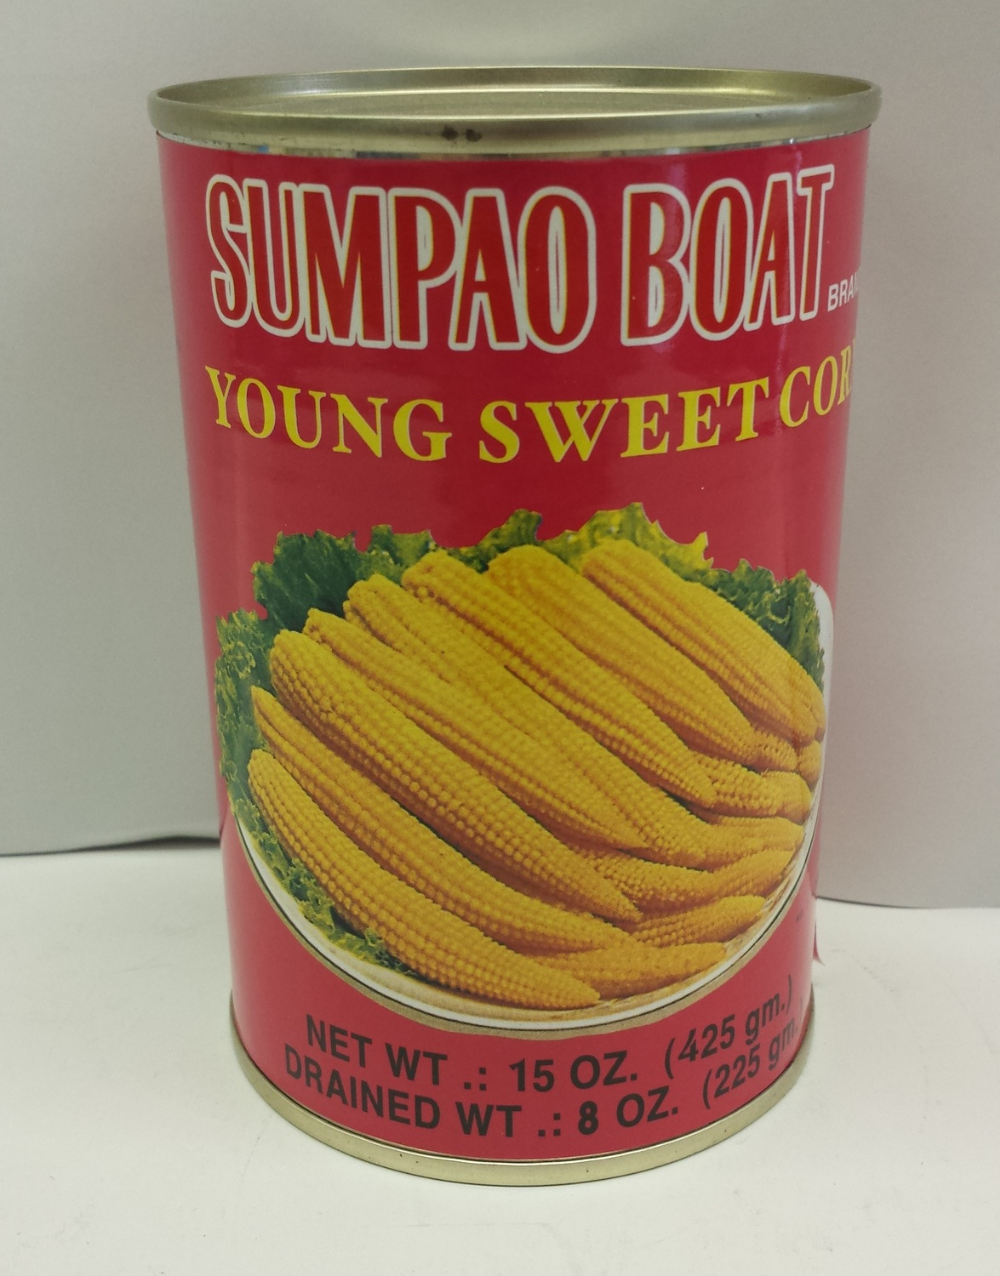 Young Sweet Corn    Sumpao Boat   VC19120 6x5 lbs  VC19125 24x15 oz  VC19127 6xA10